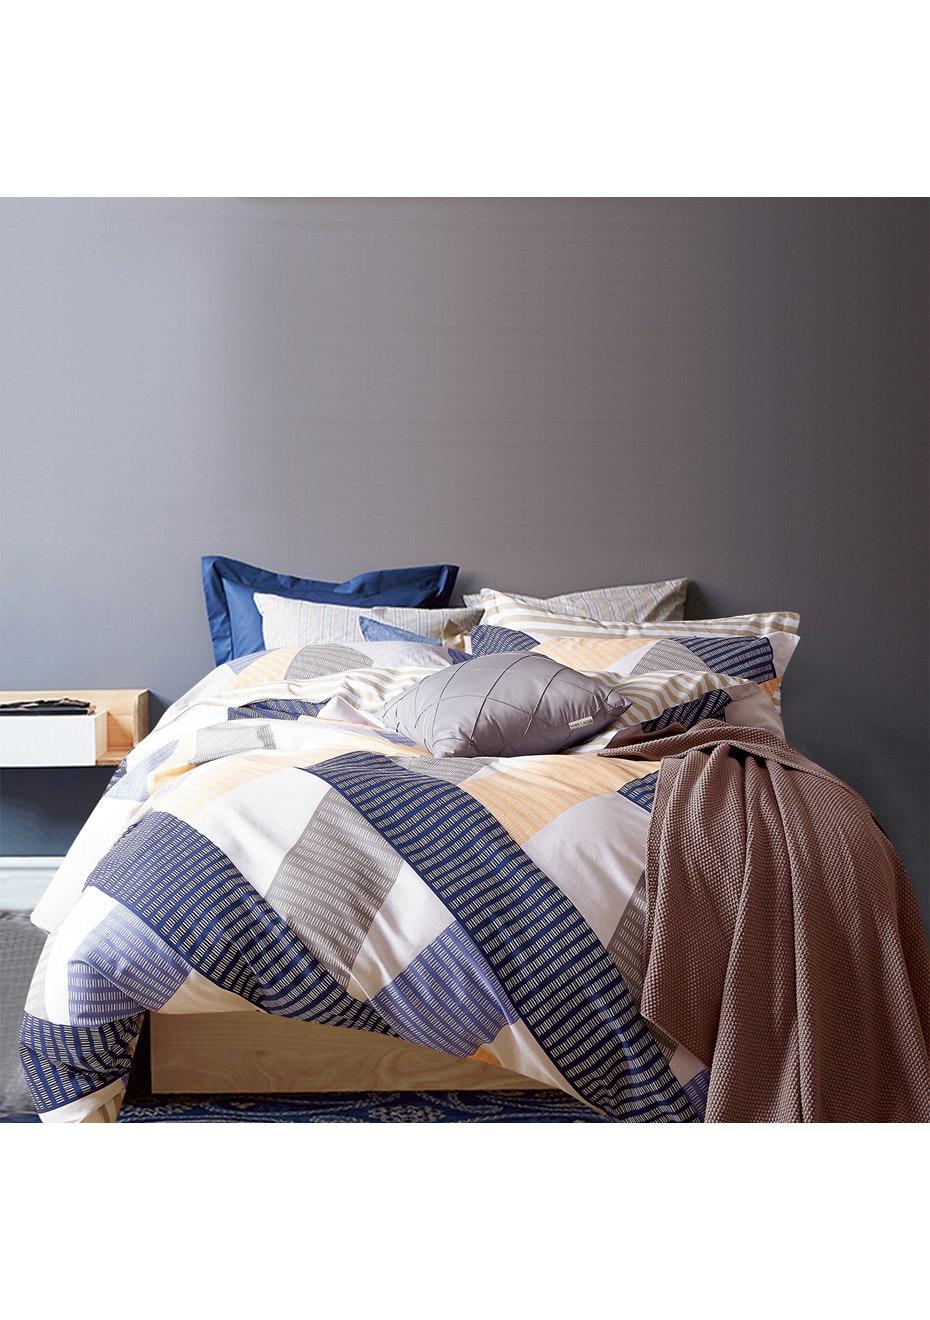 Terrigal Quilt Cover Set - Reversible Design - 100% Cotton - King Bed